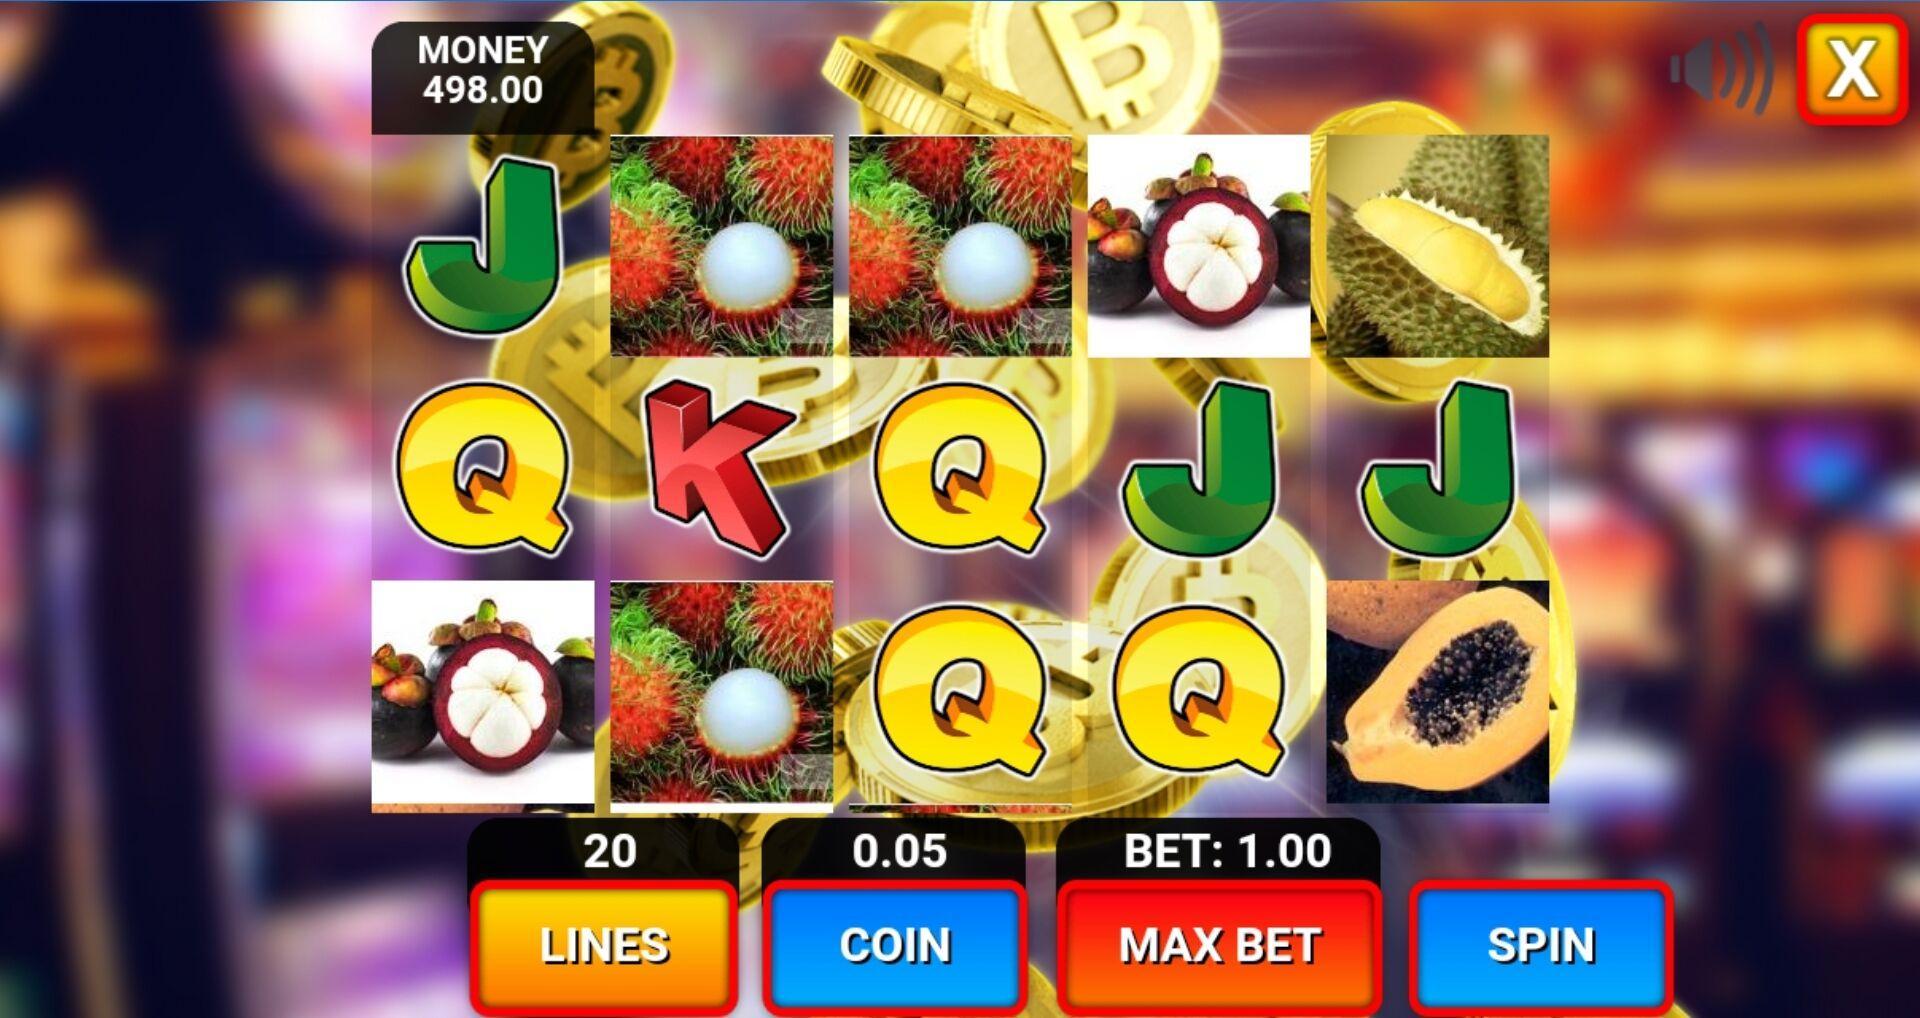 Slot Judi Buah 1 0 Apk Download Com Wslotjudibuah 9127250 Apk Free